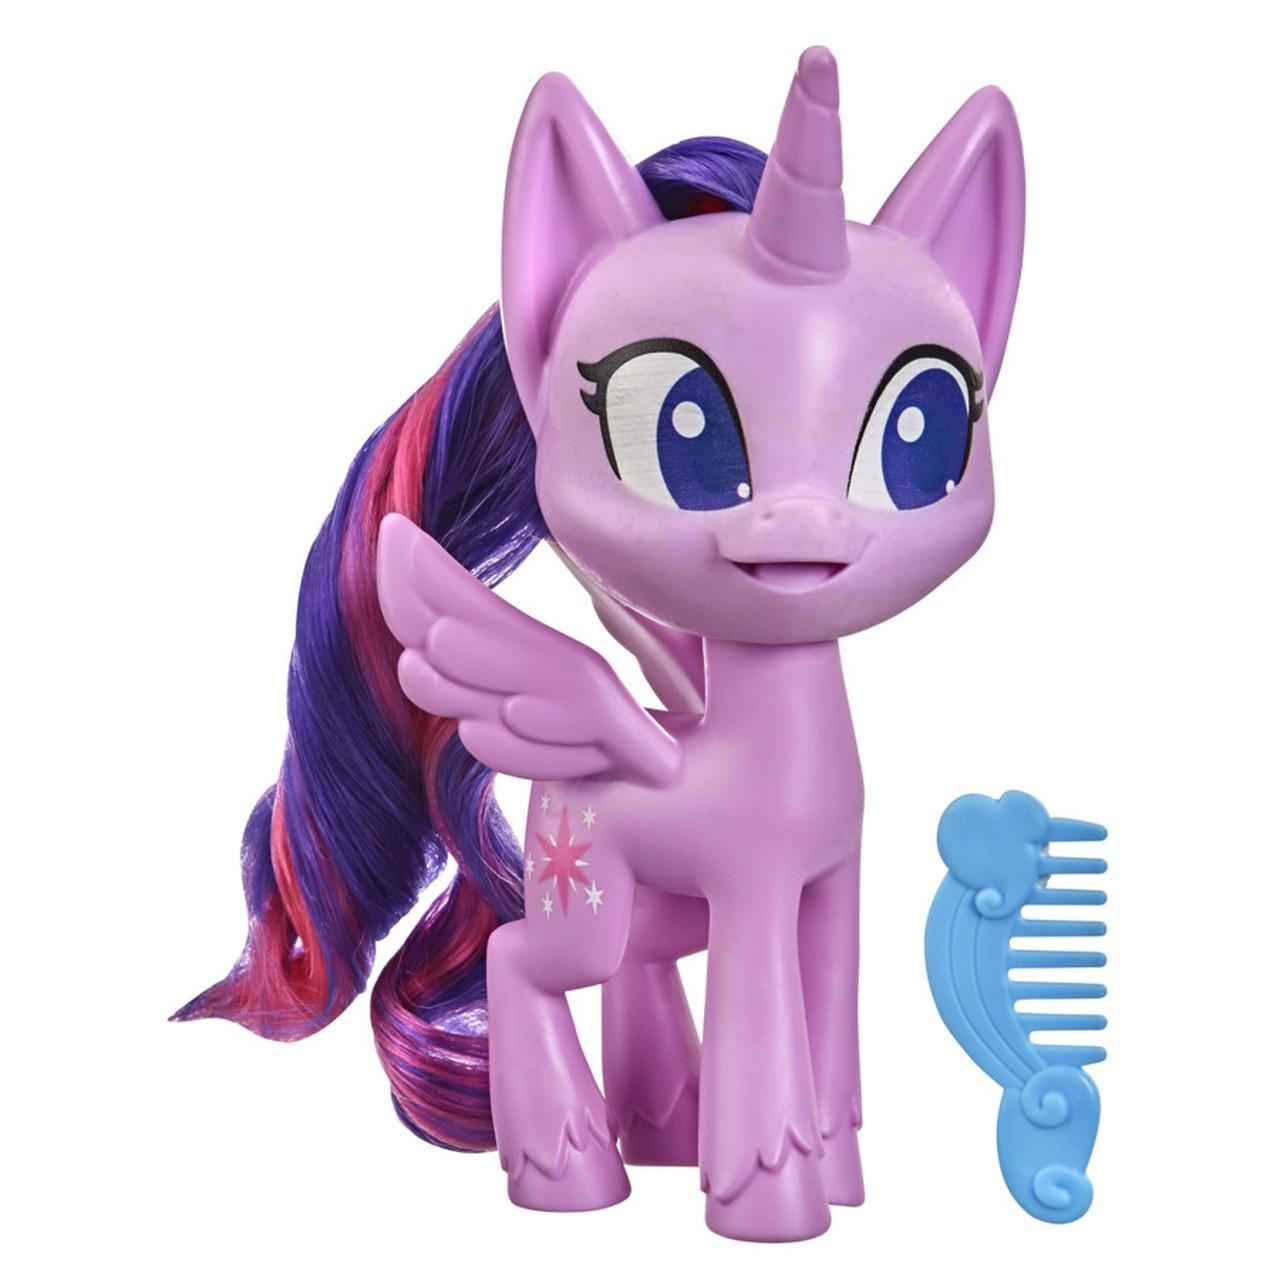 Boneca My Little Pony Twilight Sparkle 15cm - Hasbro F0164